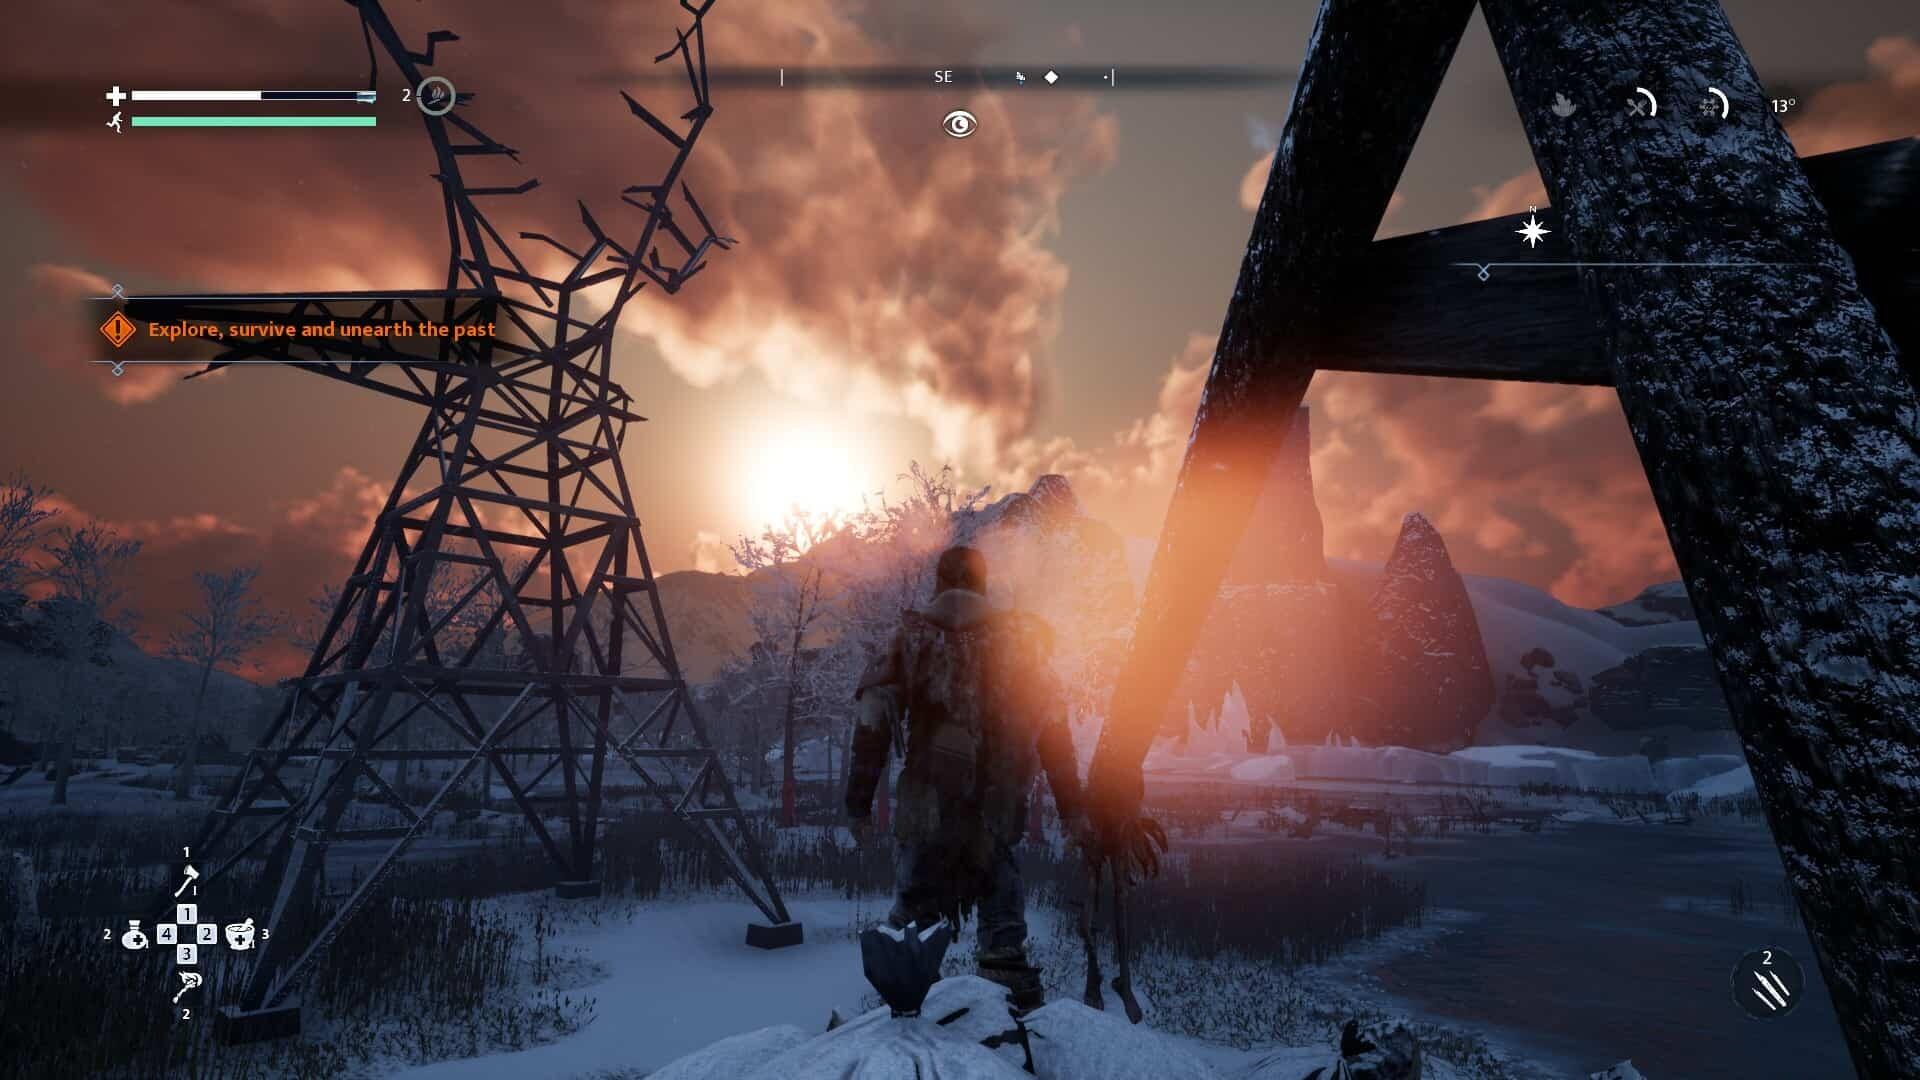 Fade to Silence game screenshot, exploring